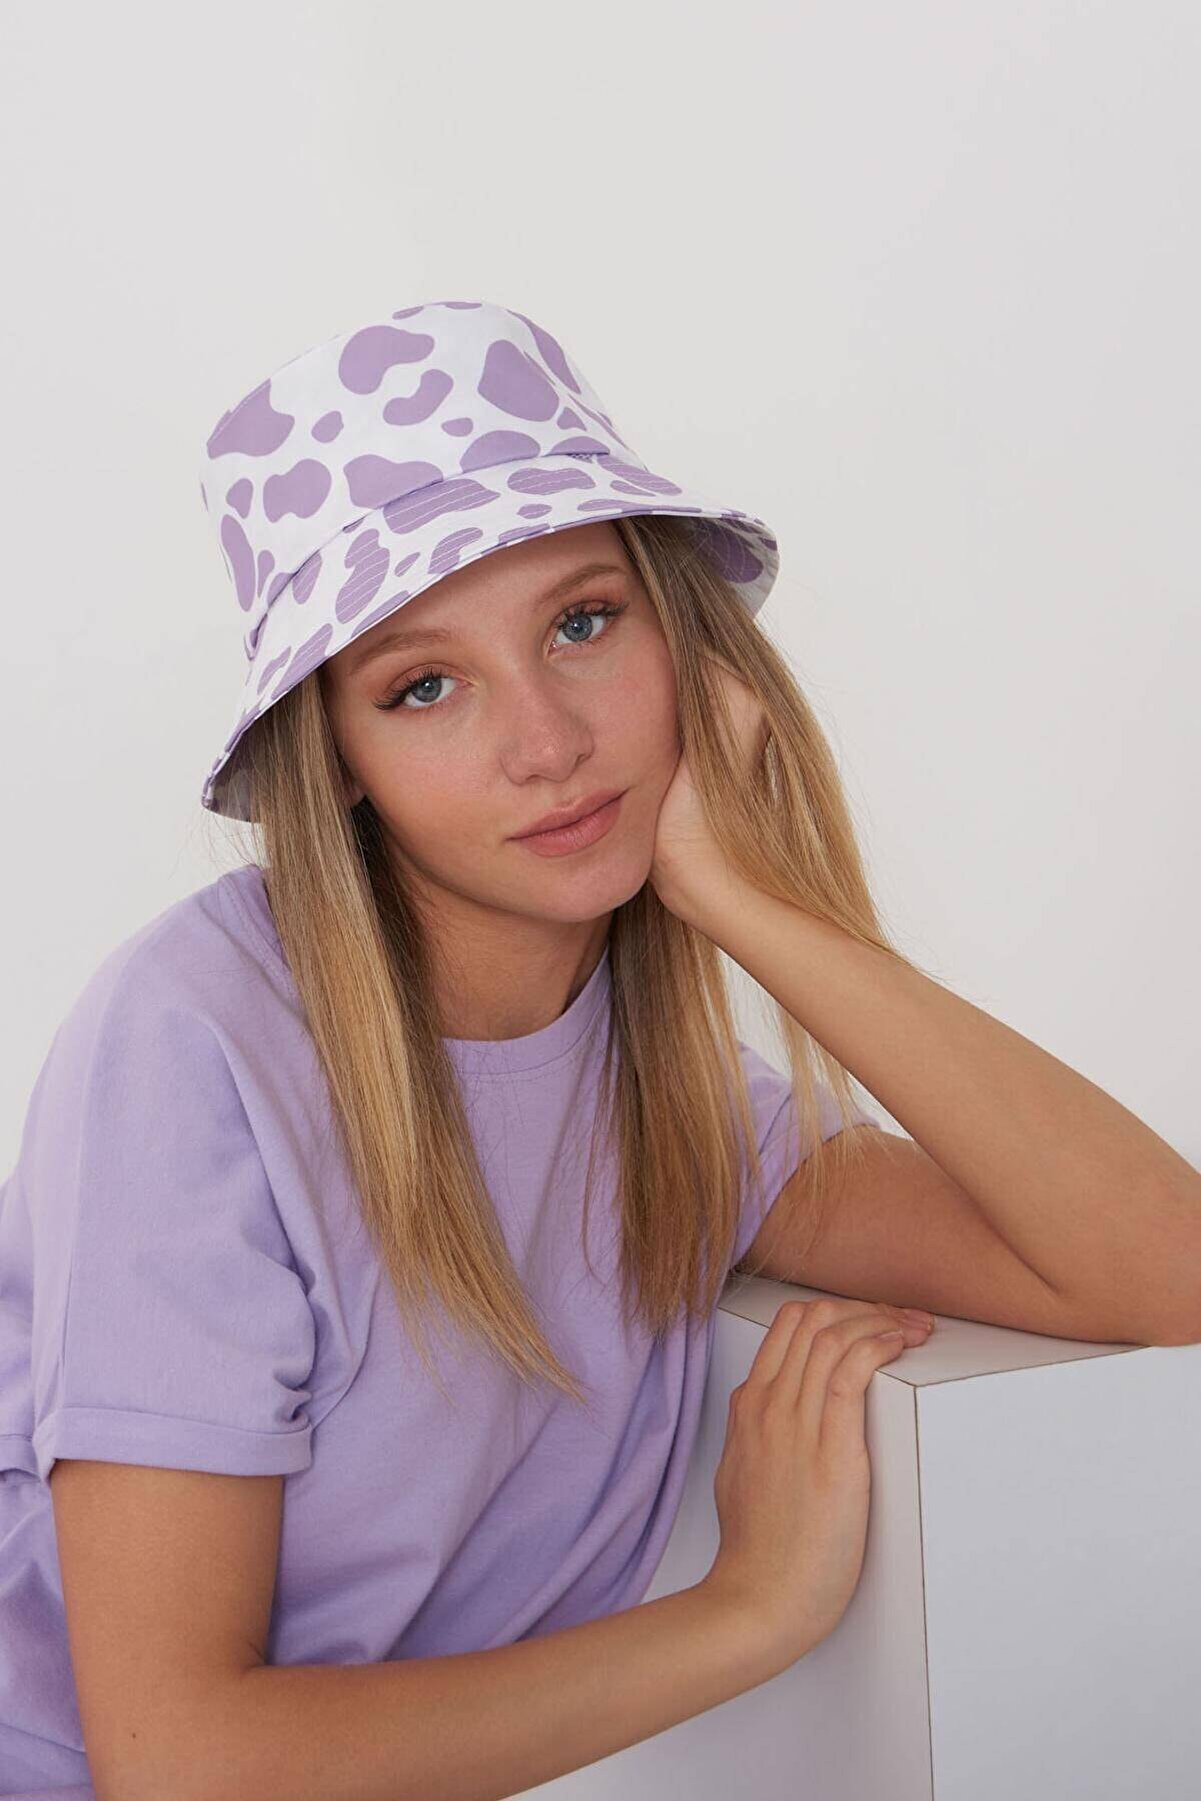 Addax Şapka Şpk1045 - E2